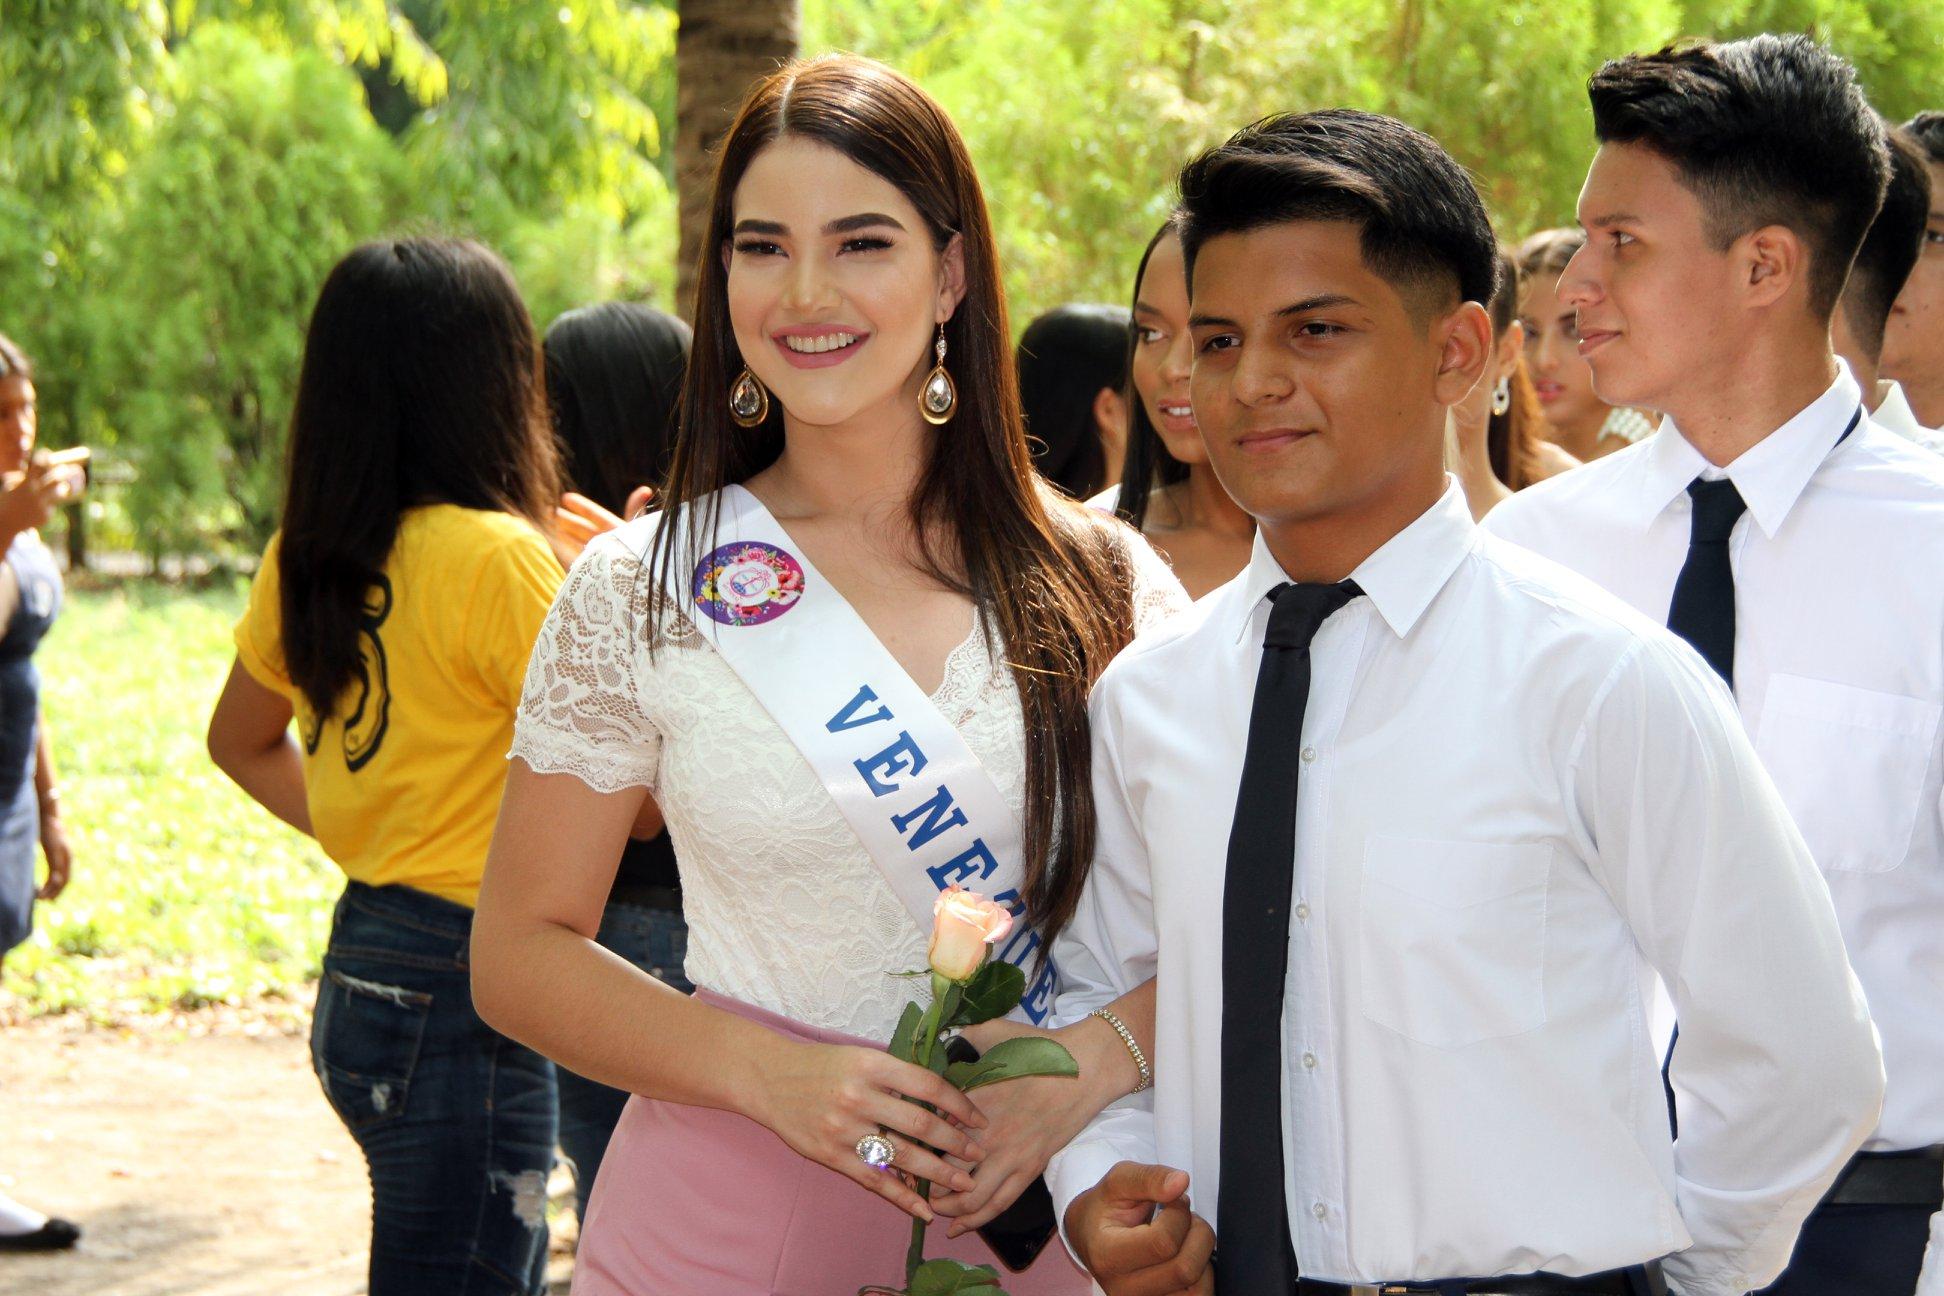 daniela di venere, top 12 de miss teen mundial 2019. - Página 5 61121510